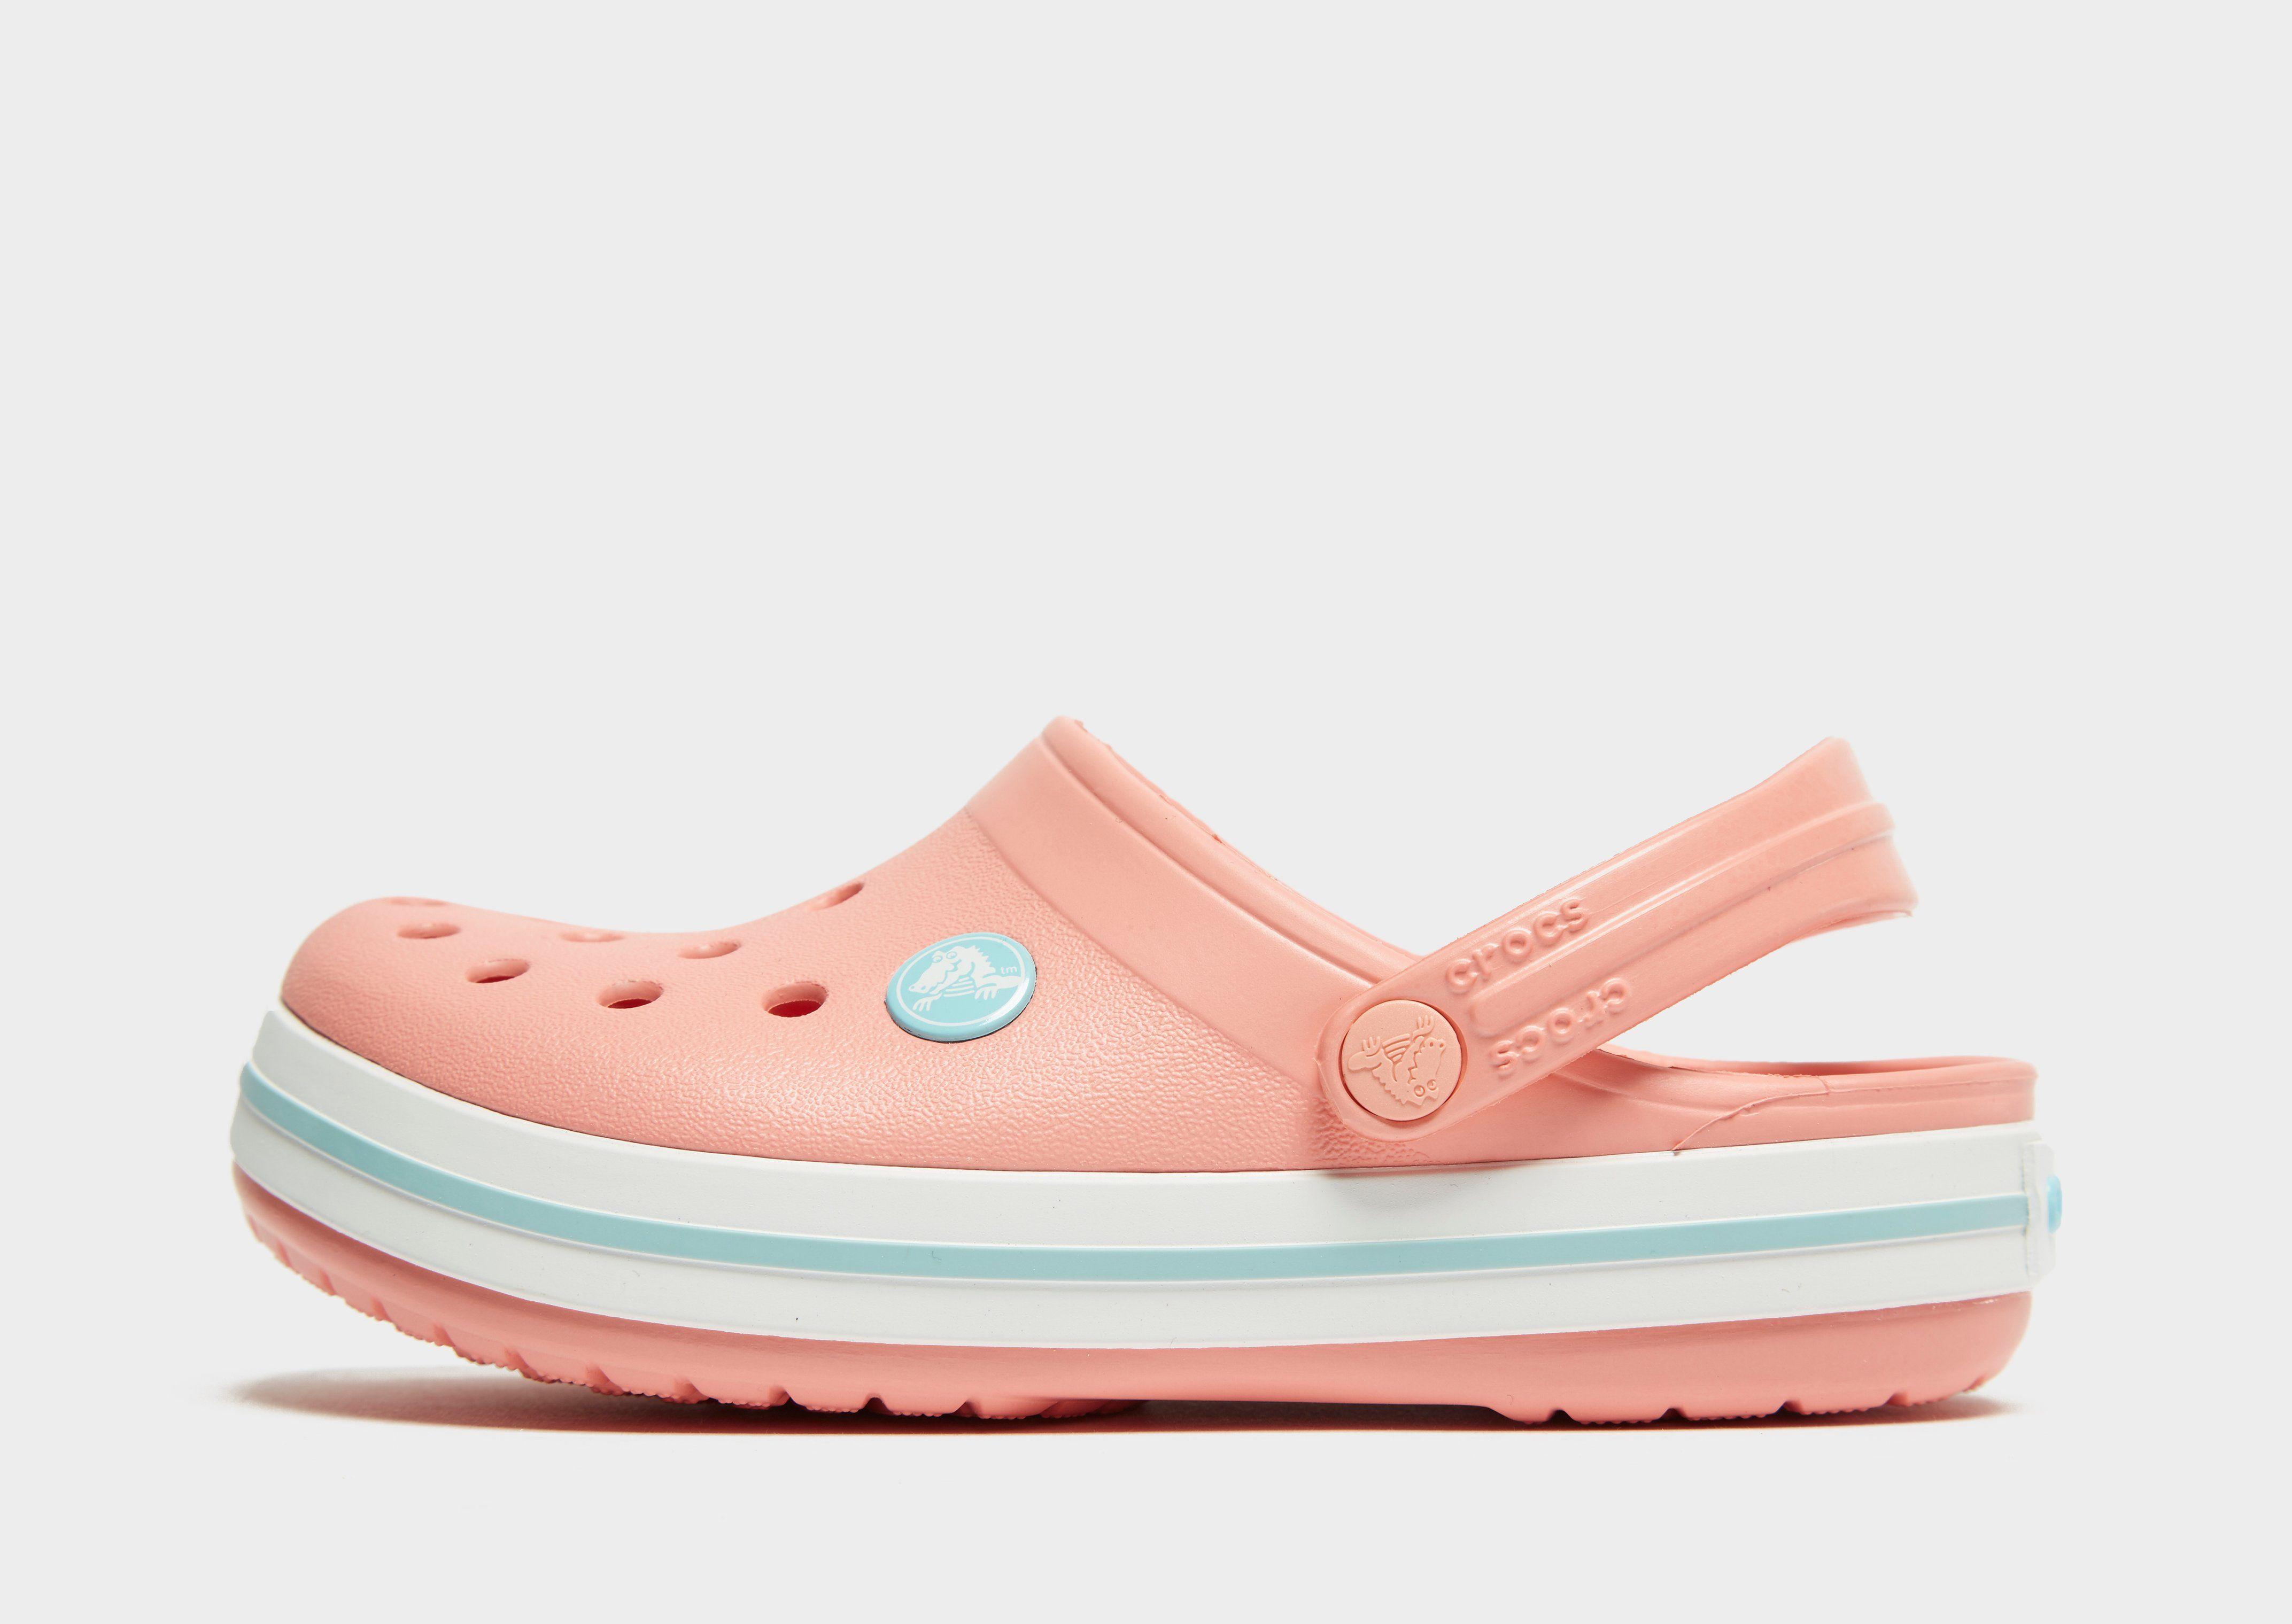 3b8adb408d4b9 Crocs Crocband Clog Sandals Children | JD Sports Ireland